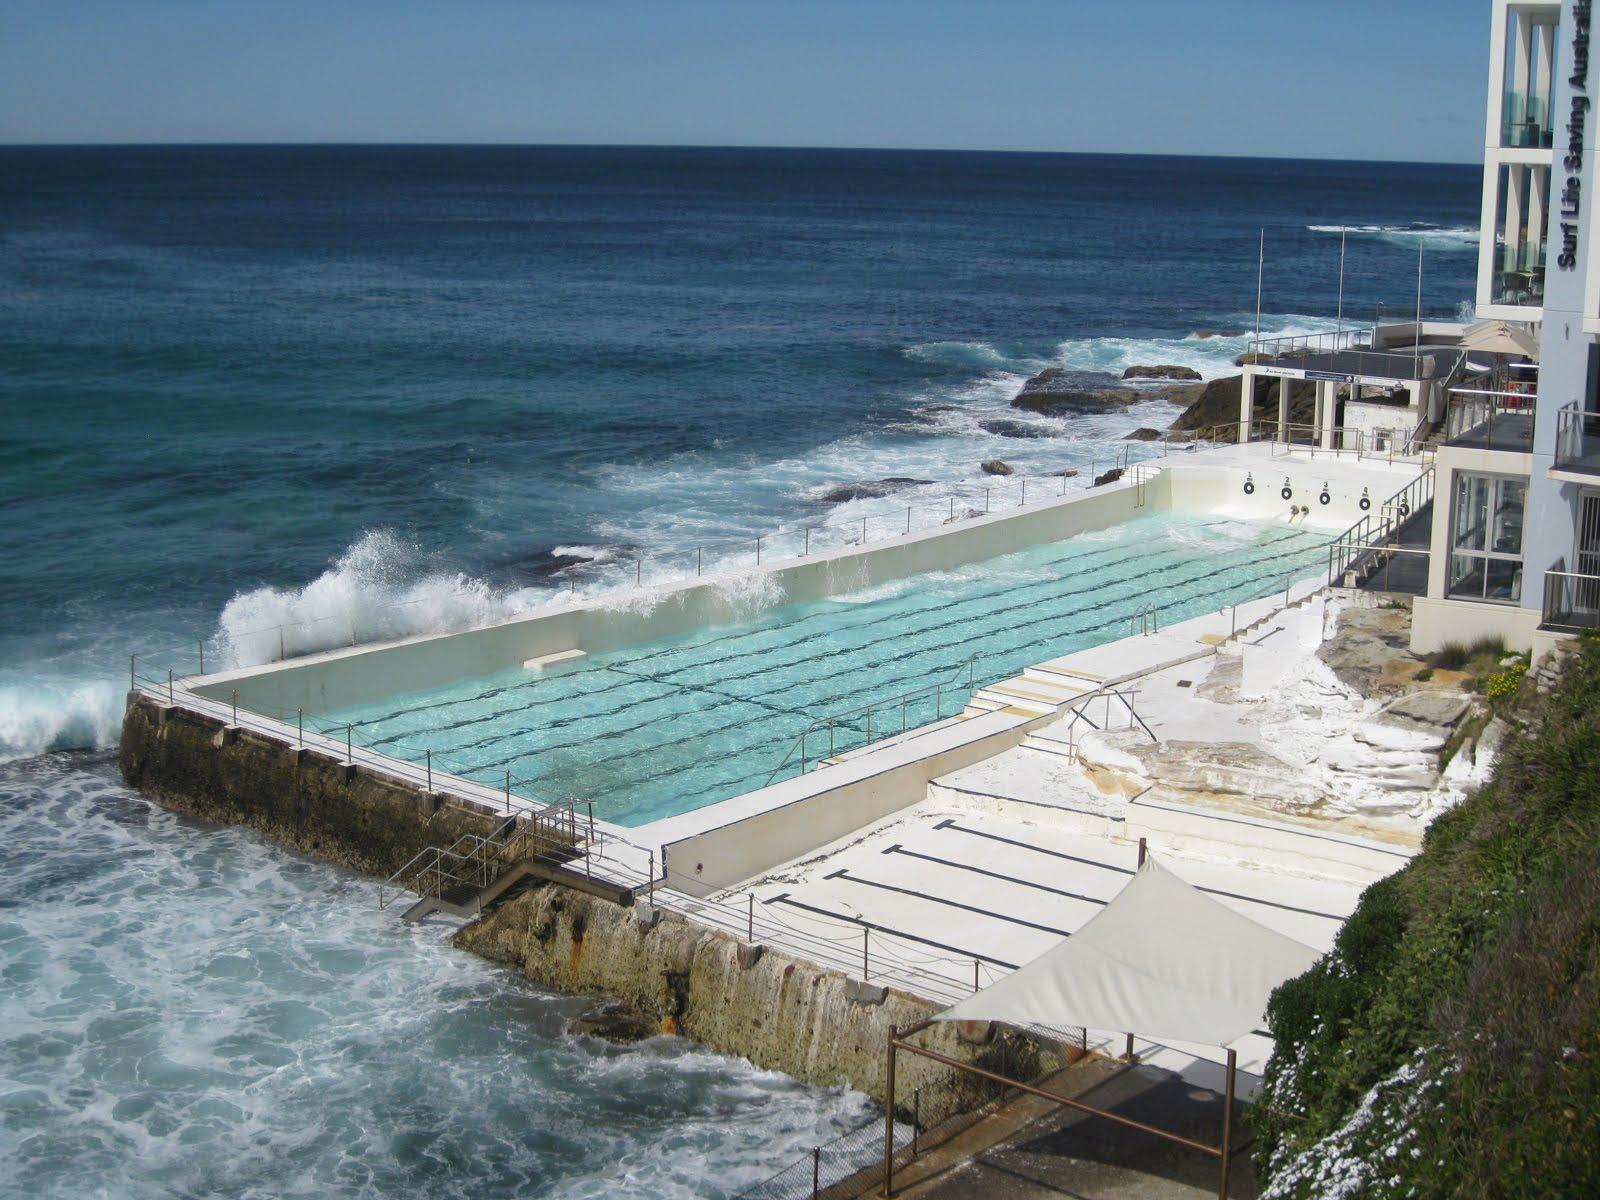 Las piscinas mas espectaculares taringa for Piscinas espectaculares